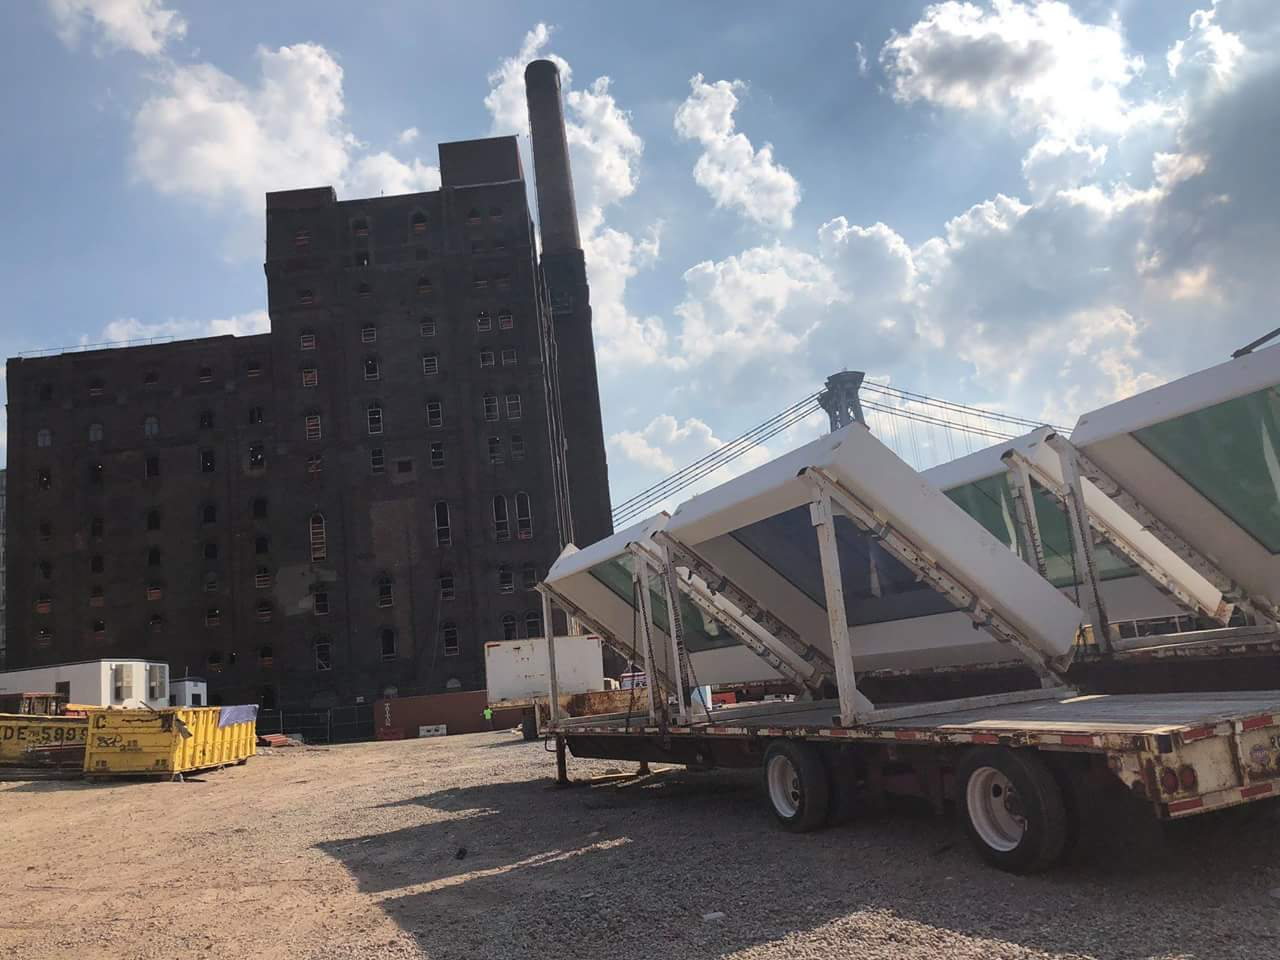 3-D printed windows arriving at the Domino Sugar Refinery project site. Photo via  Gate Precast.